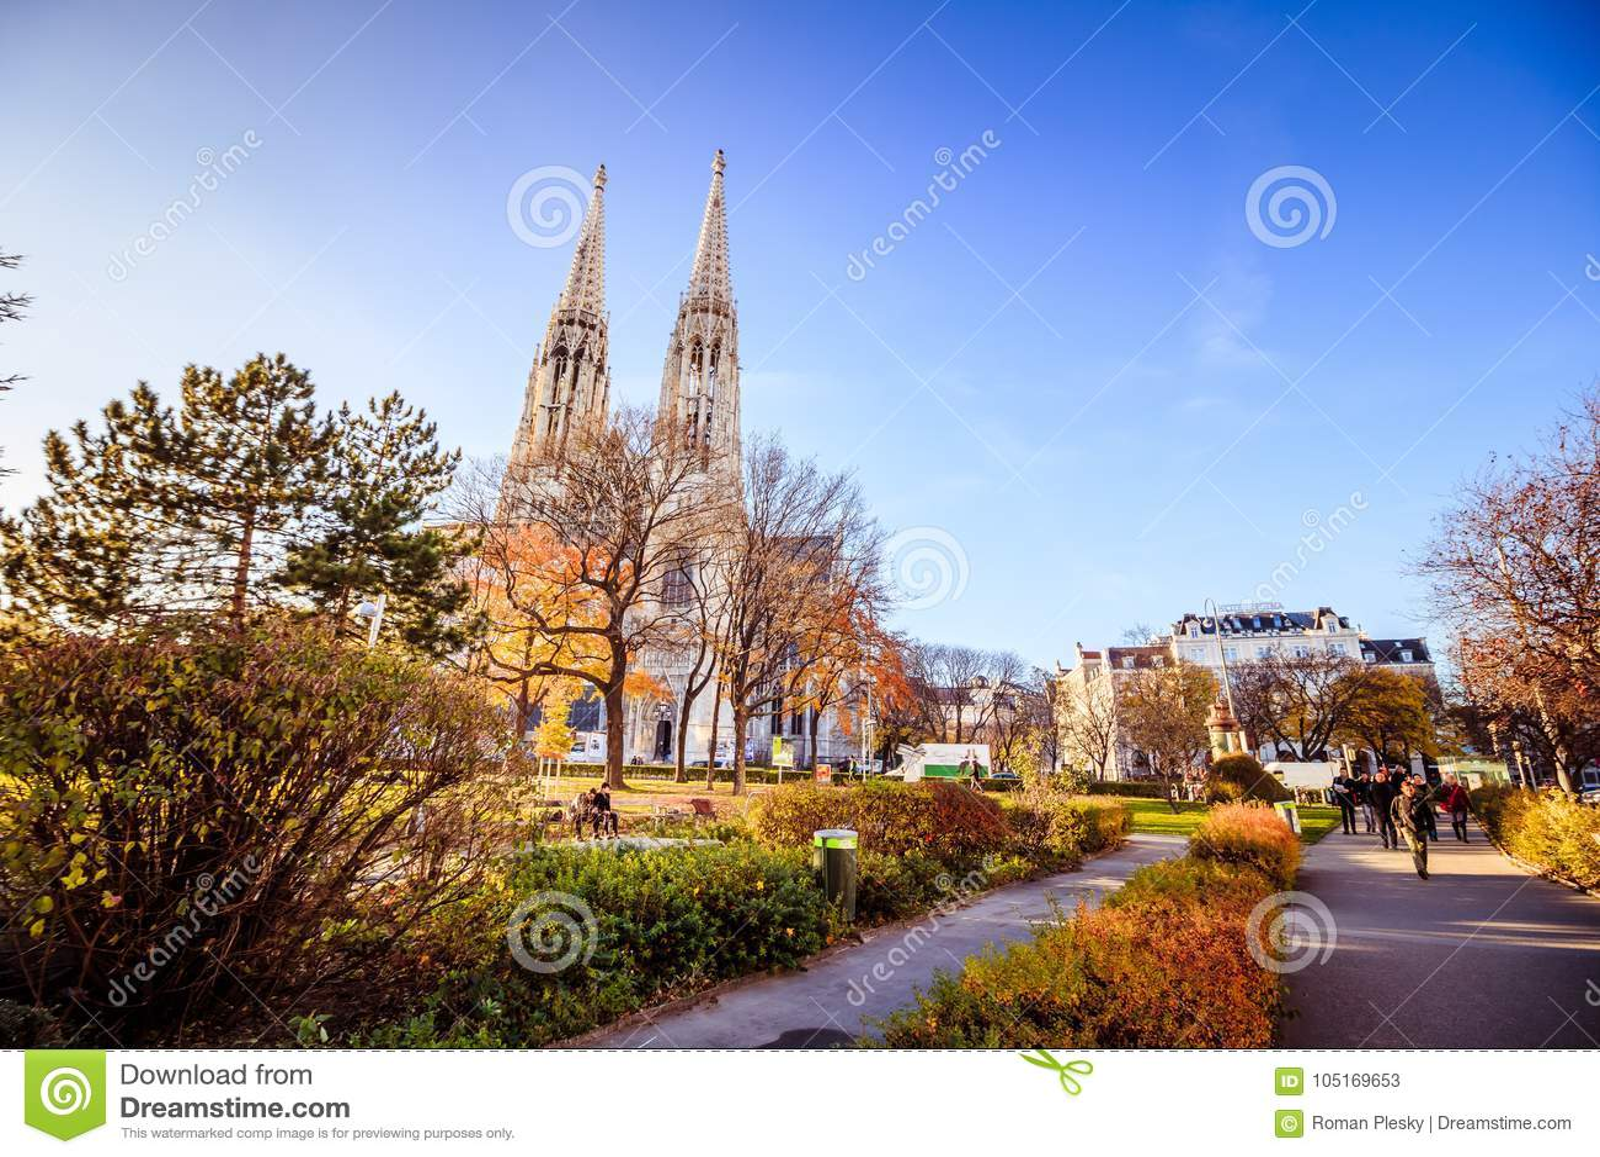 Igreja de Votiv em Sigmund Freud Park em Viena, Áustria